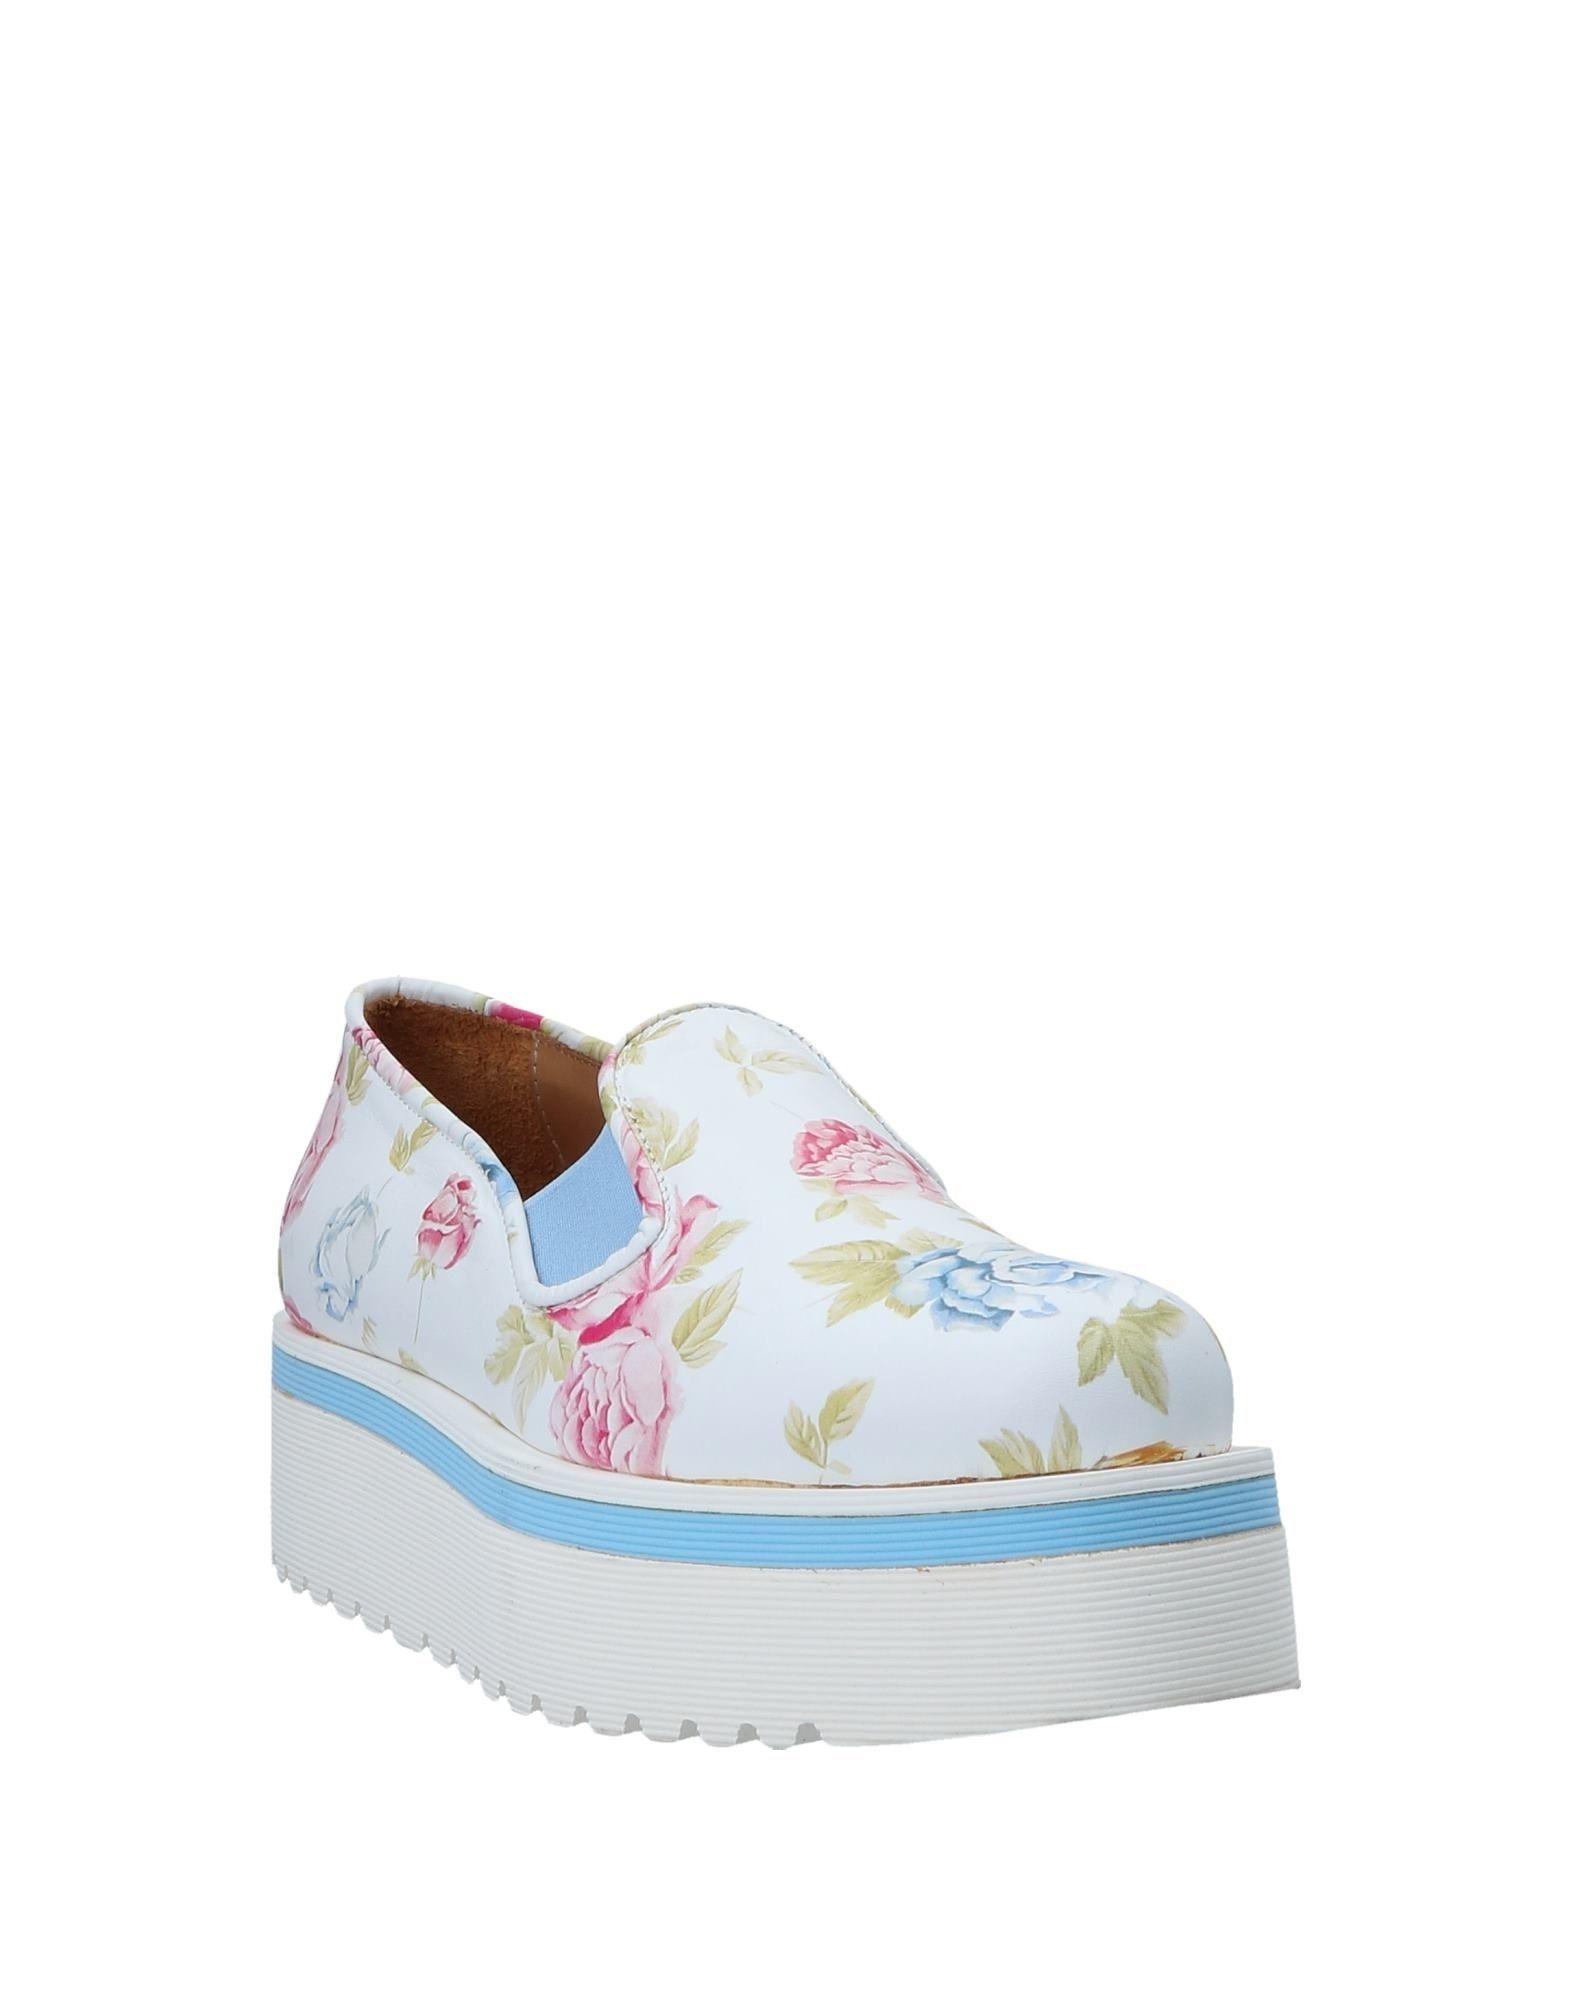 Dondup aussehende Sneakers Damen  11557479DVGut aussehende Dondup strapazierfähige Schuhe 8e413c